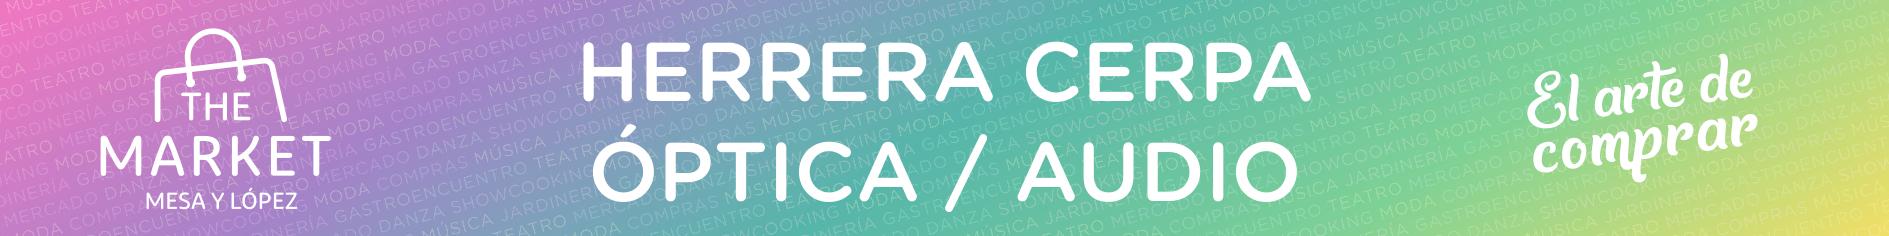 Óptica Herrera Cerpa